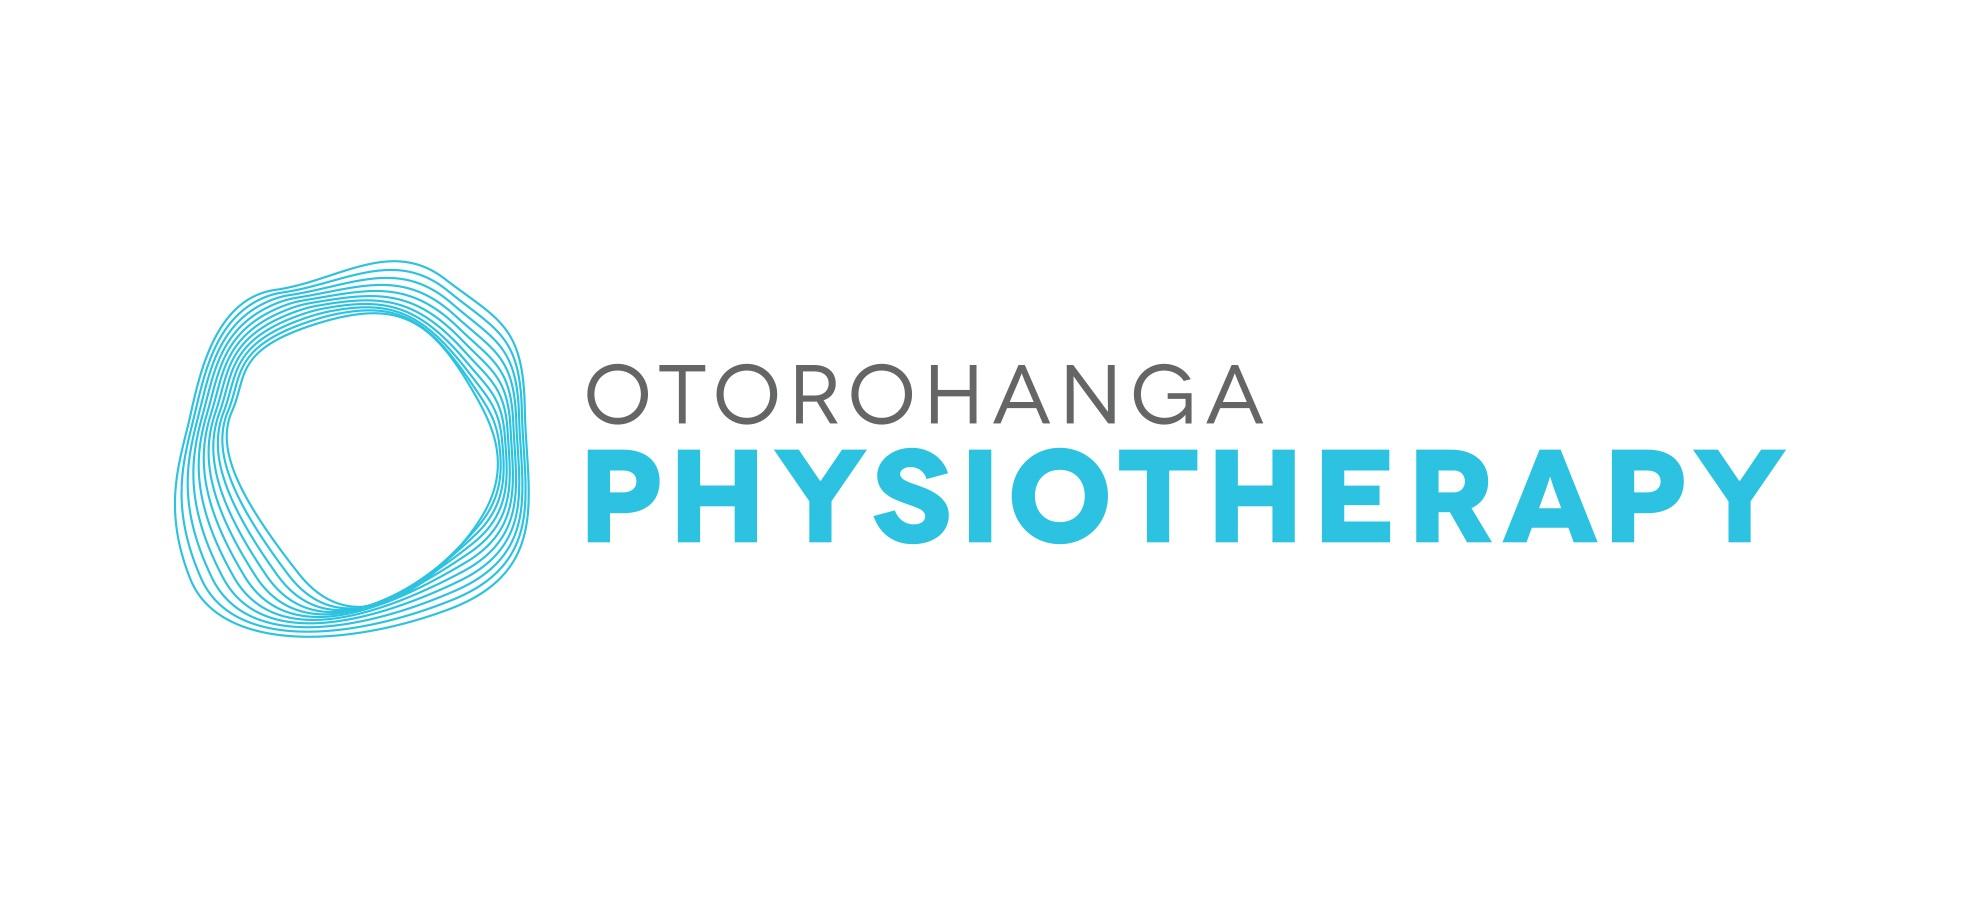 Otorohanga Physiotherapy